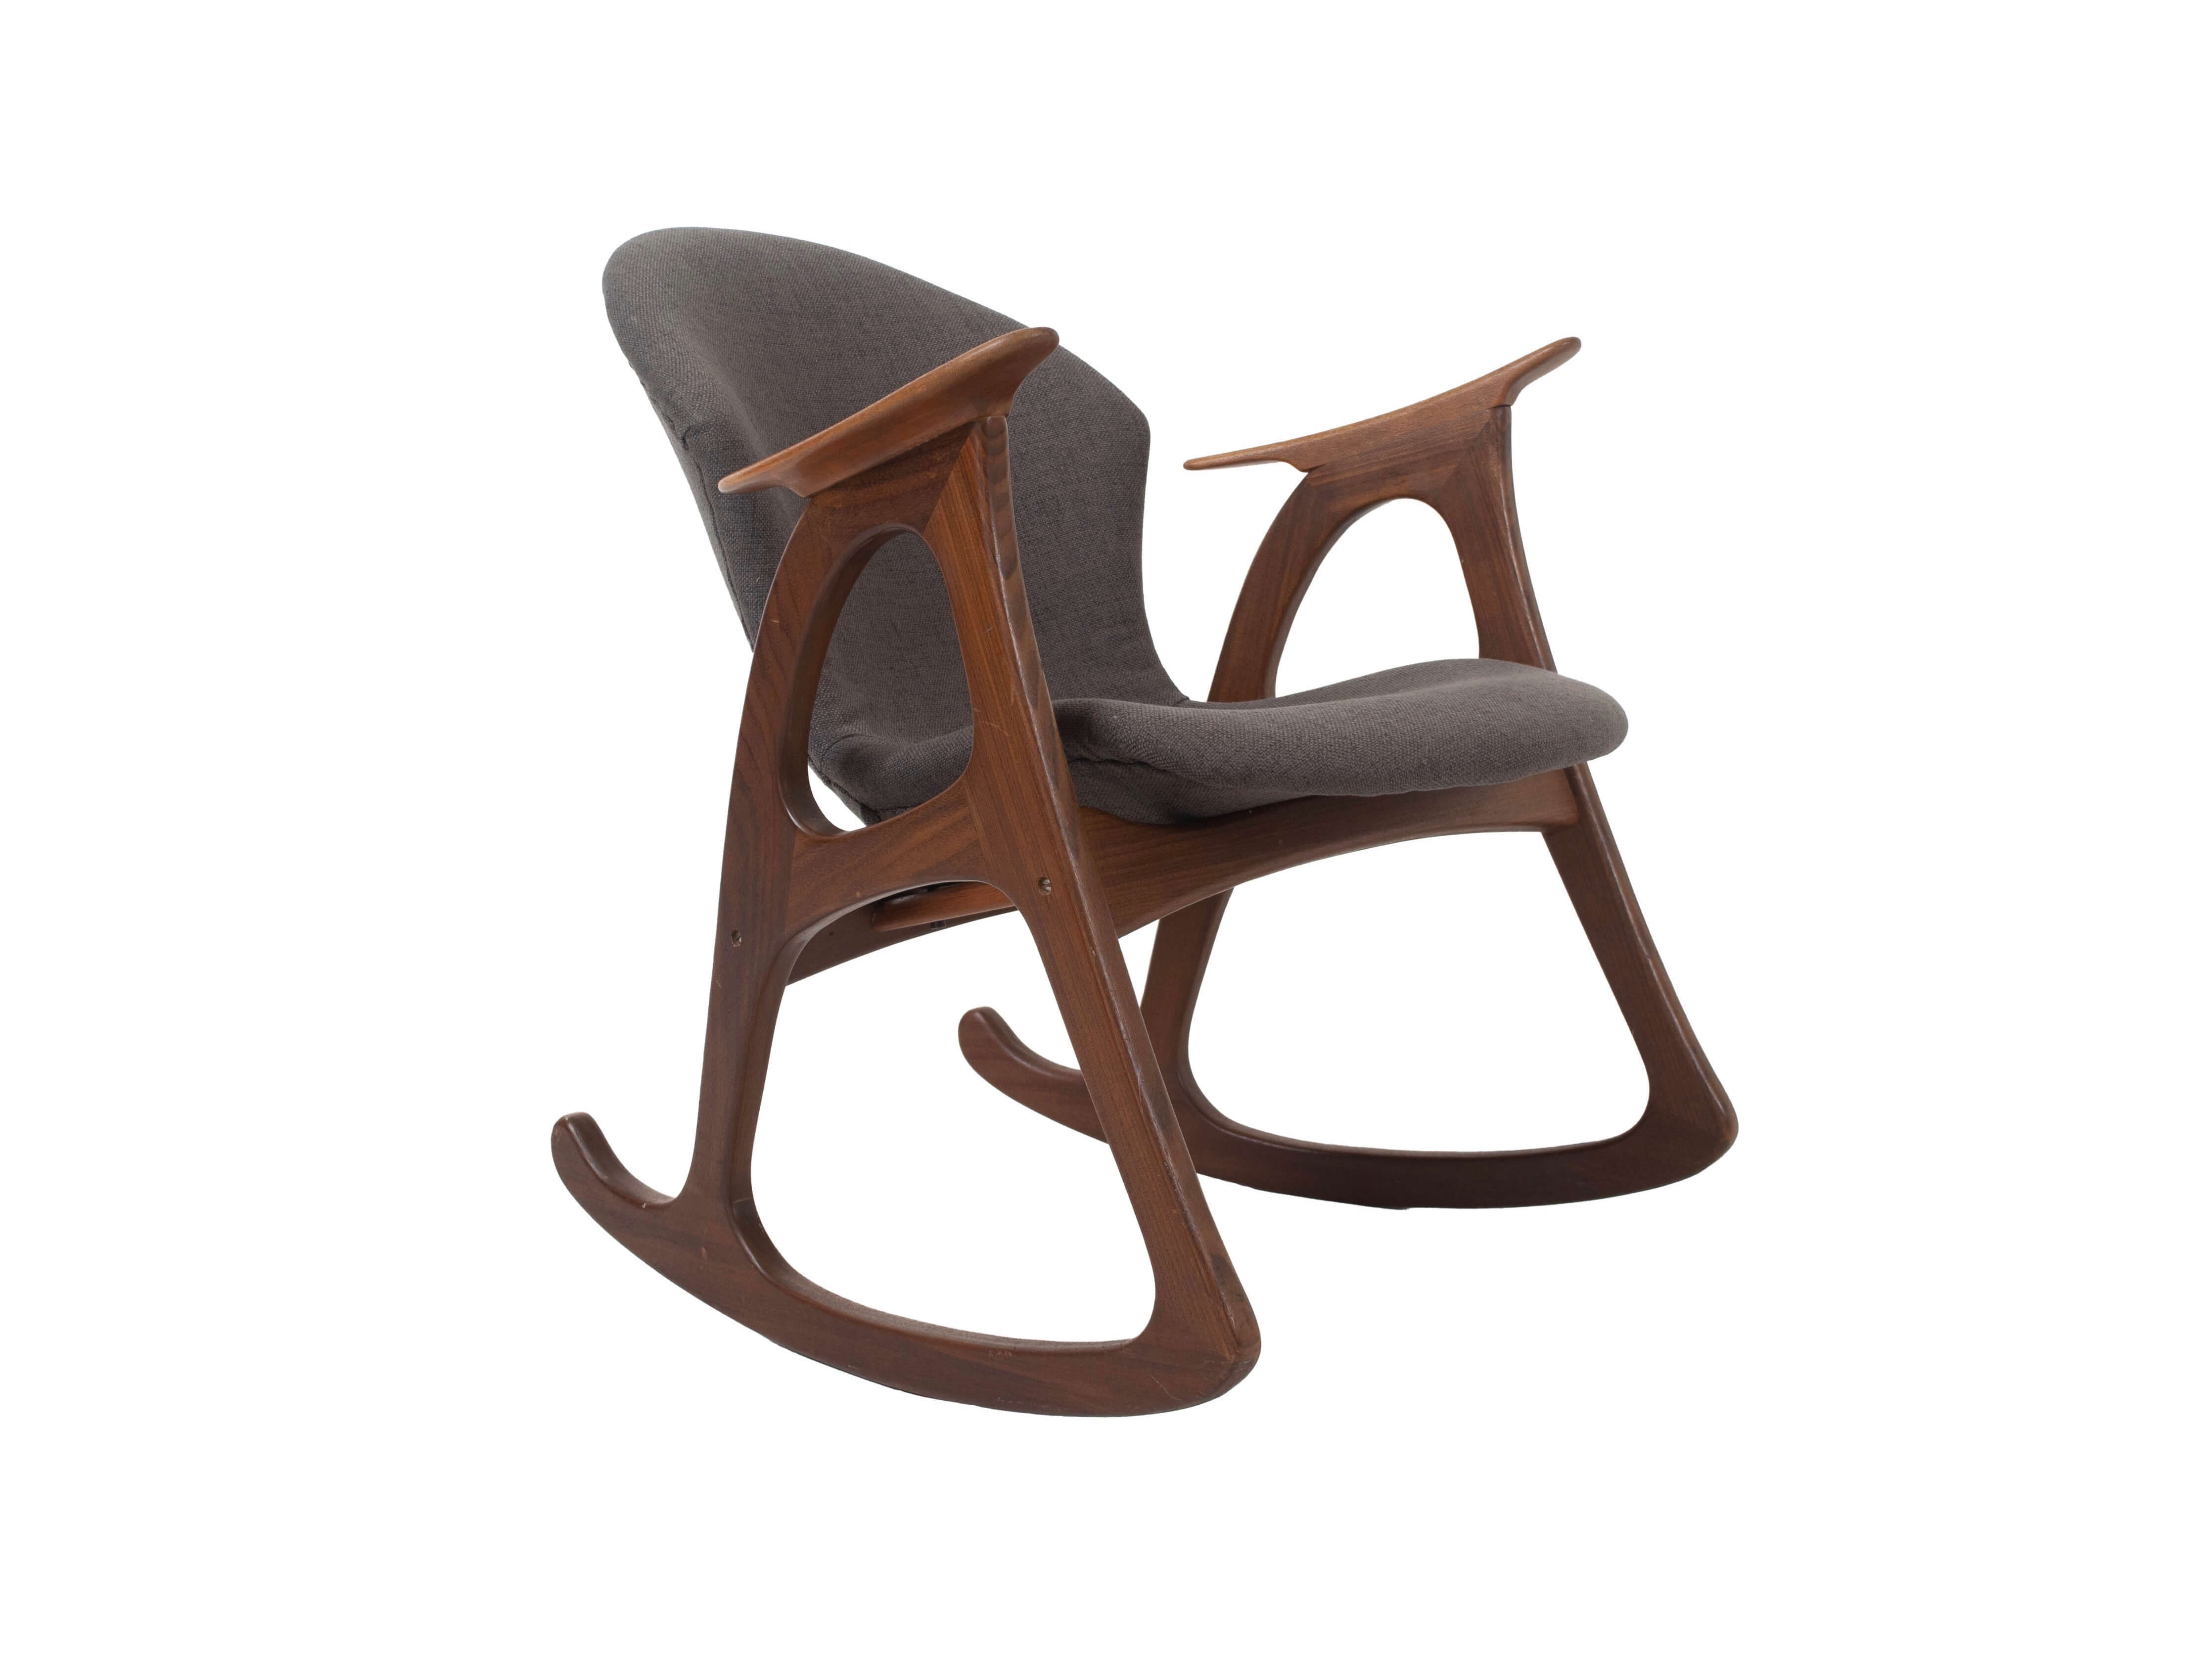 Aage Christiansen Rocking Chair for Erhardsen & Andersen, Denmark 1960s